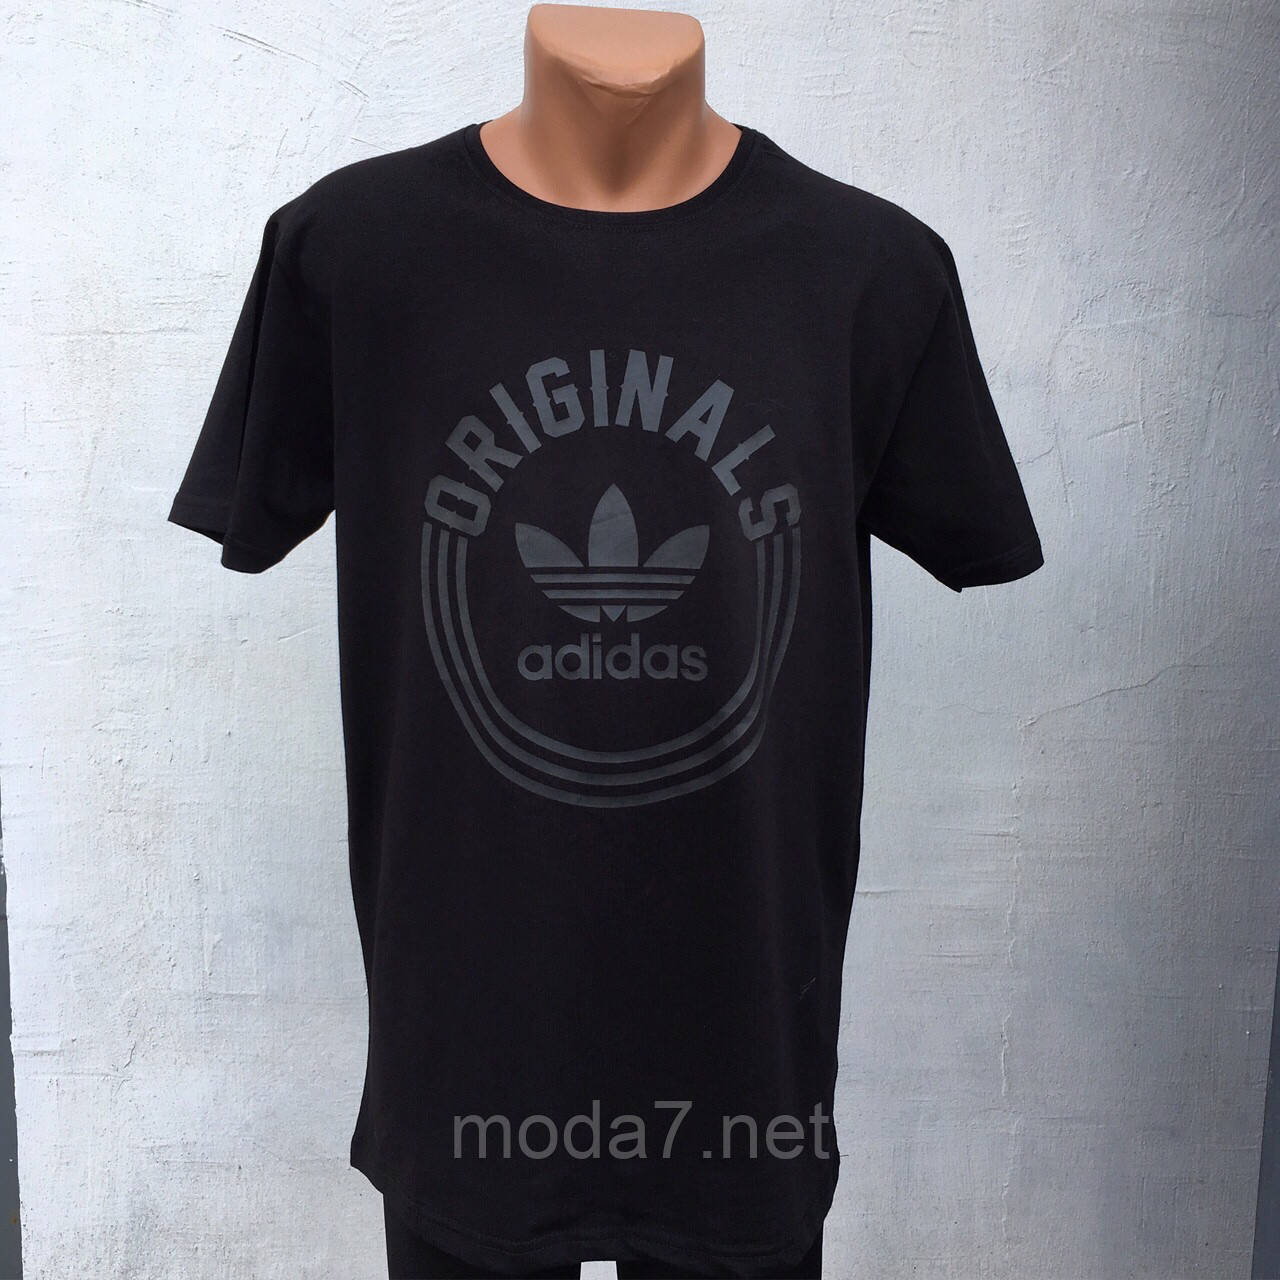 Футболка мужская черная Батал 56-62р Adidas реплика